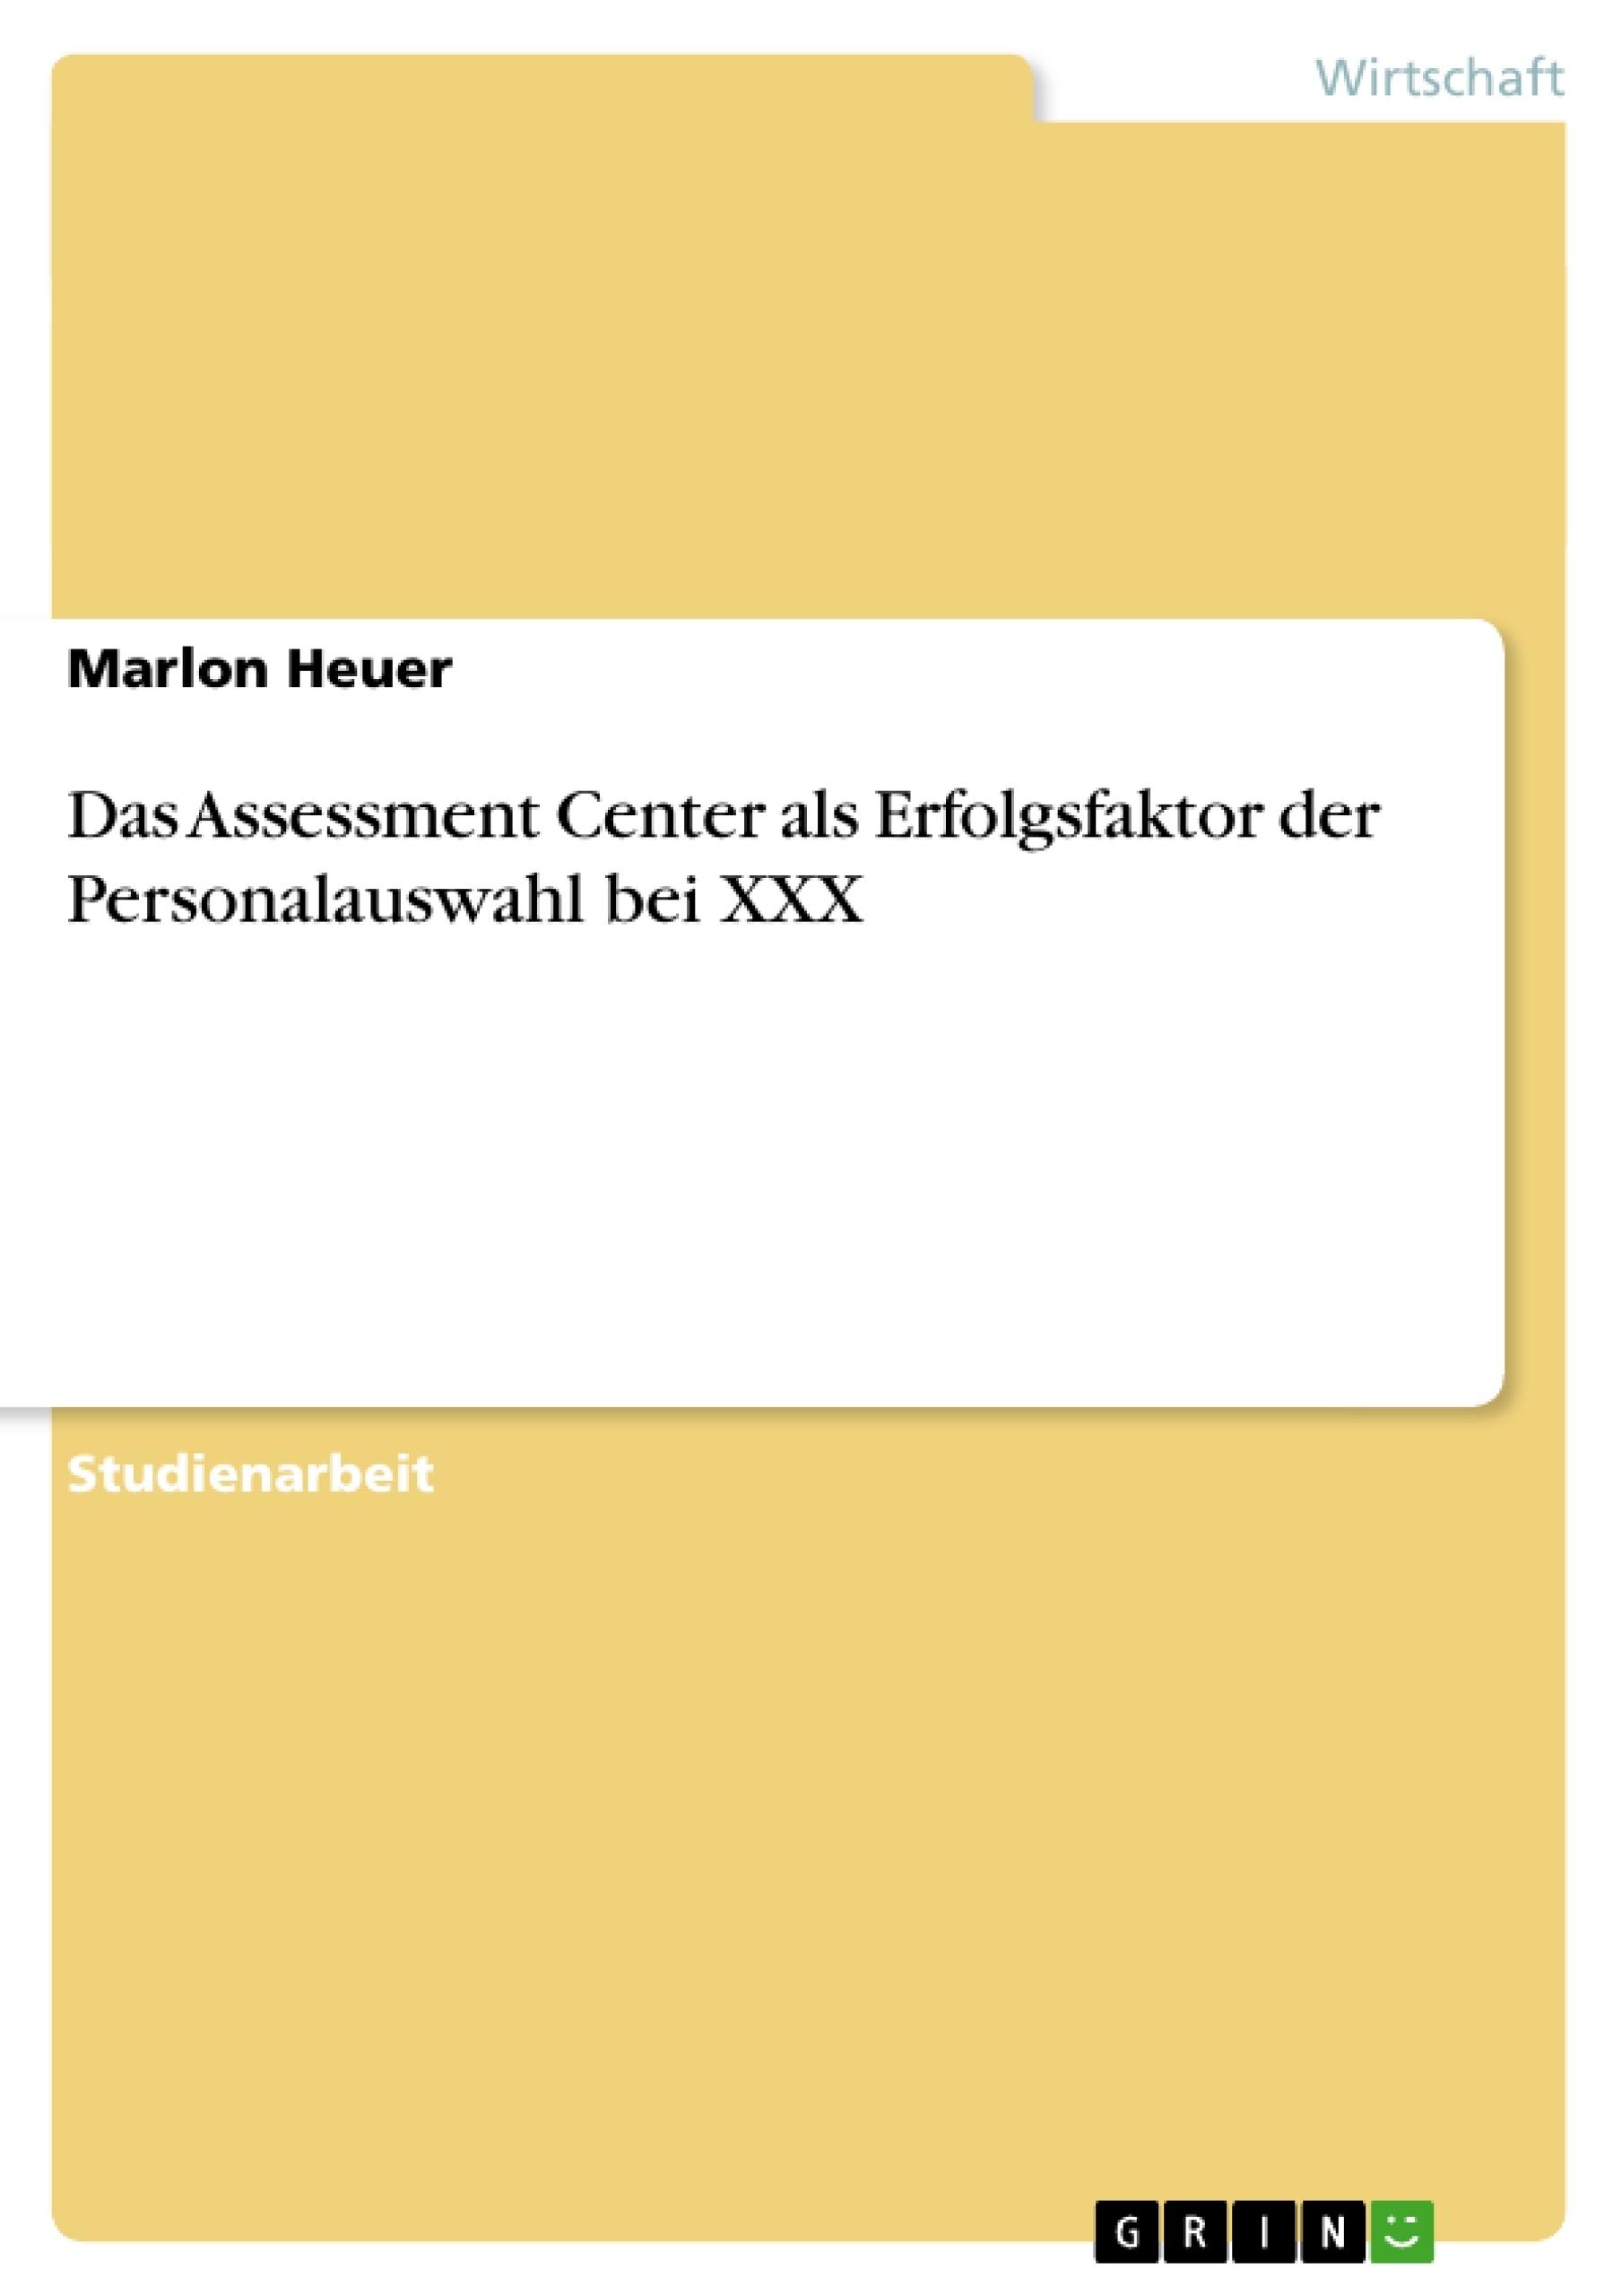 Titel: Das Assessment Center als Erfolgsfaktor der Personalauswahl bei XXX